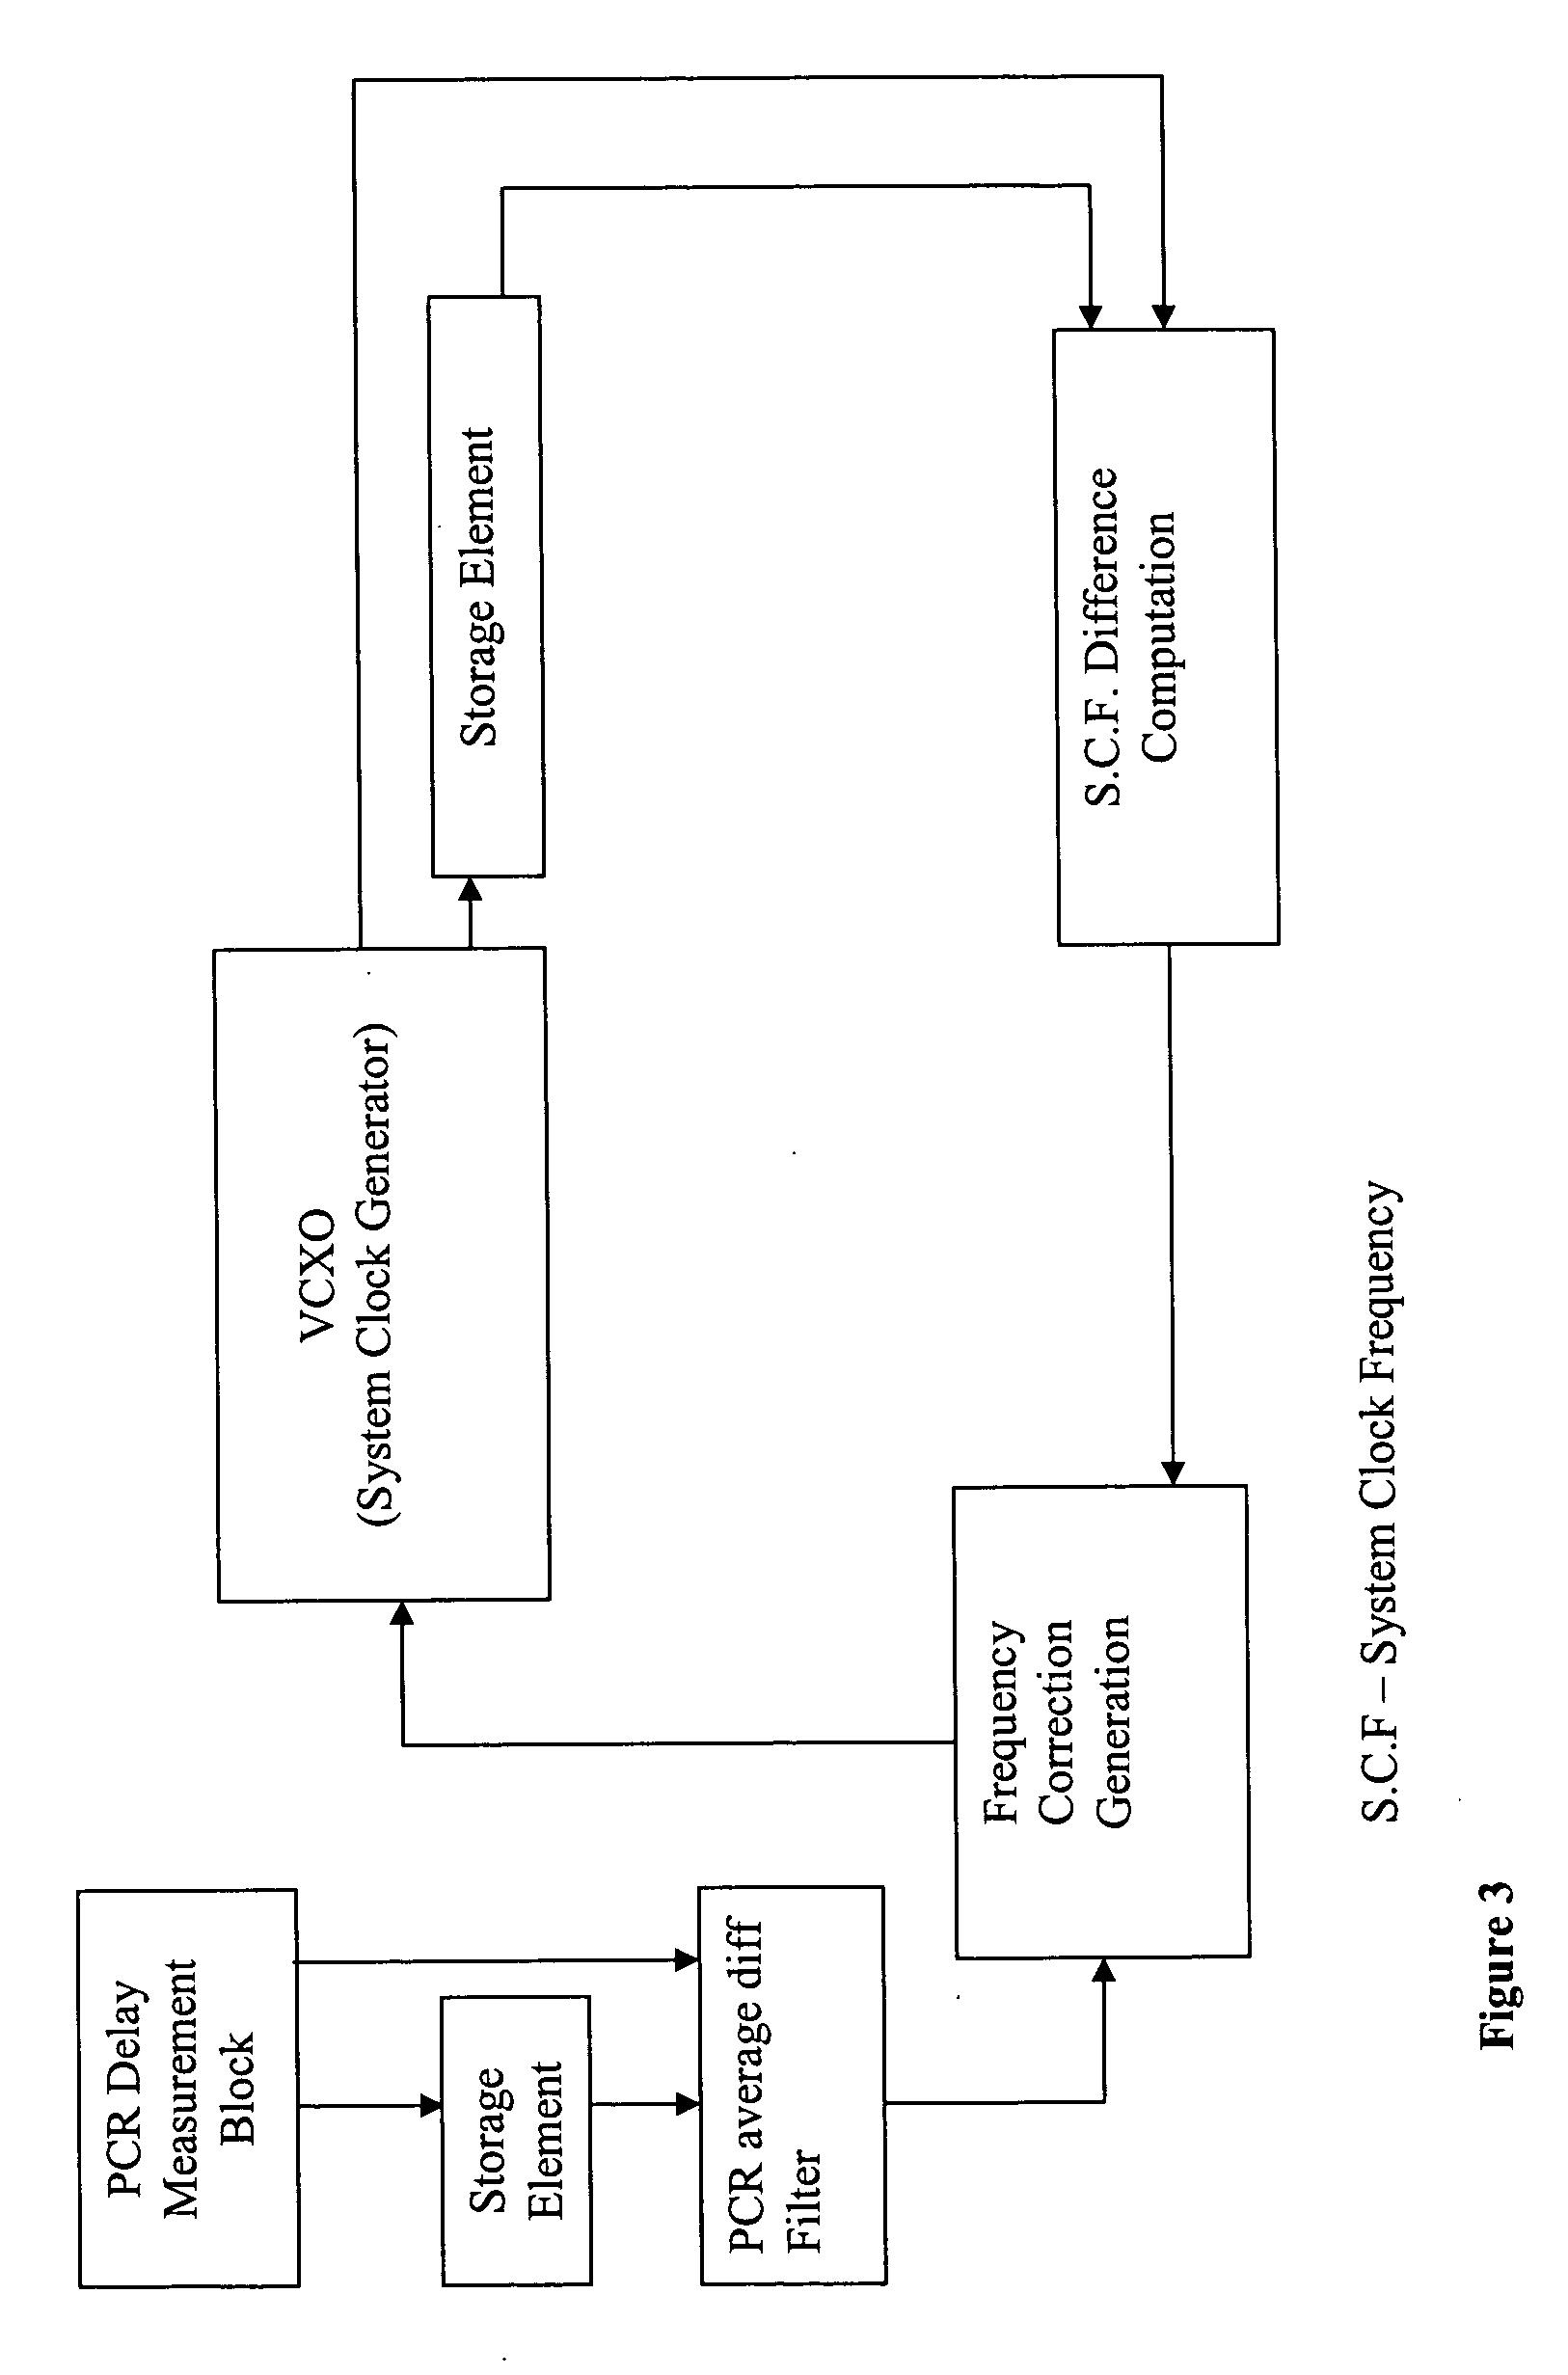 patente us20060209989